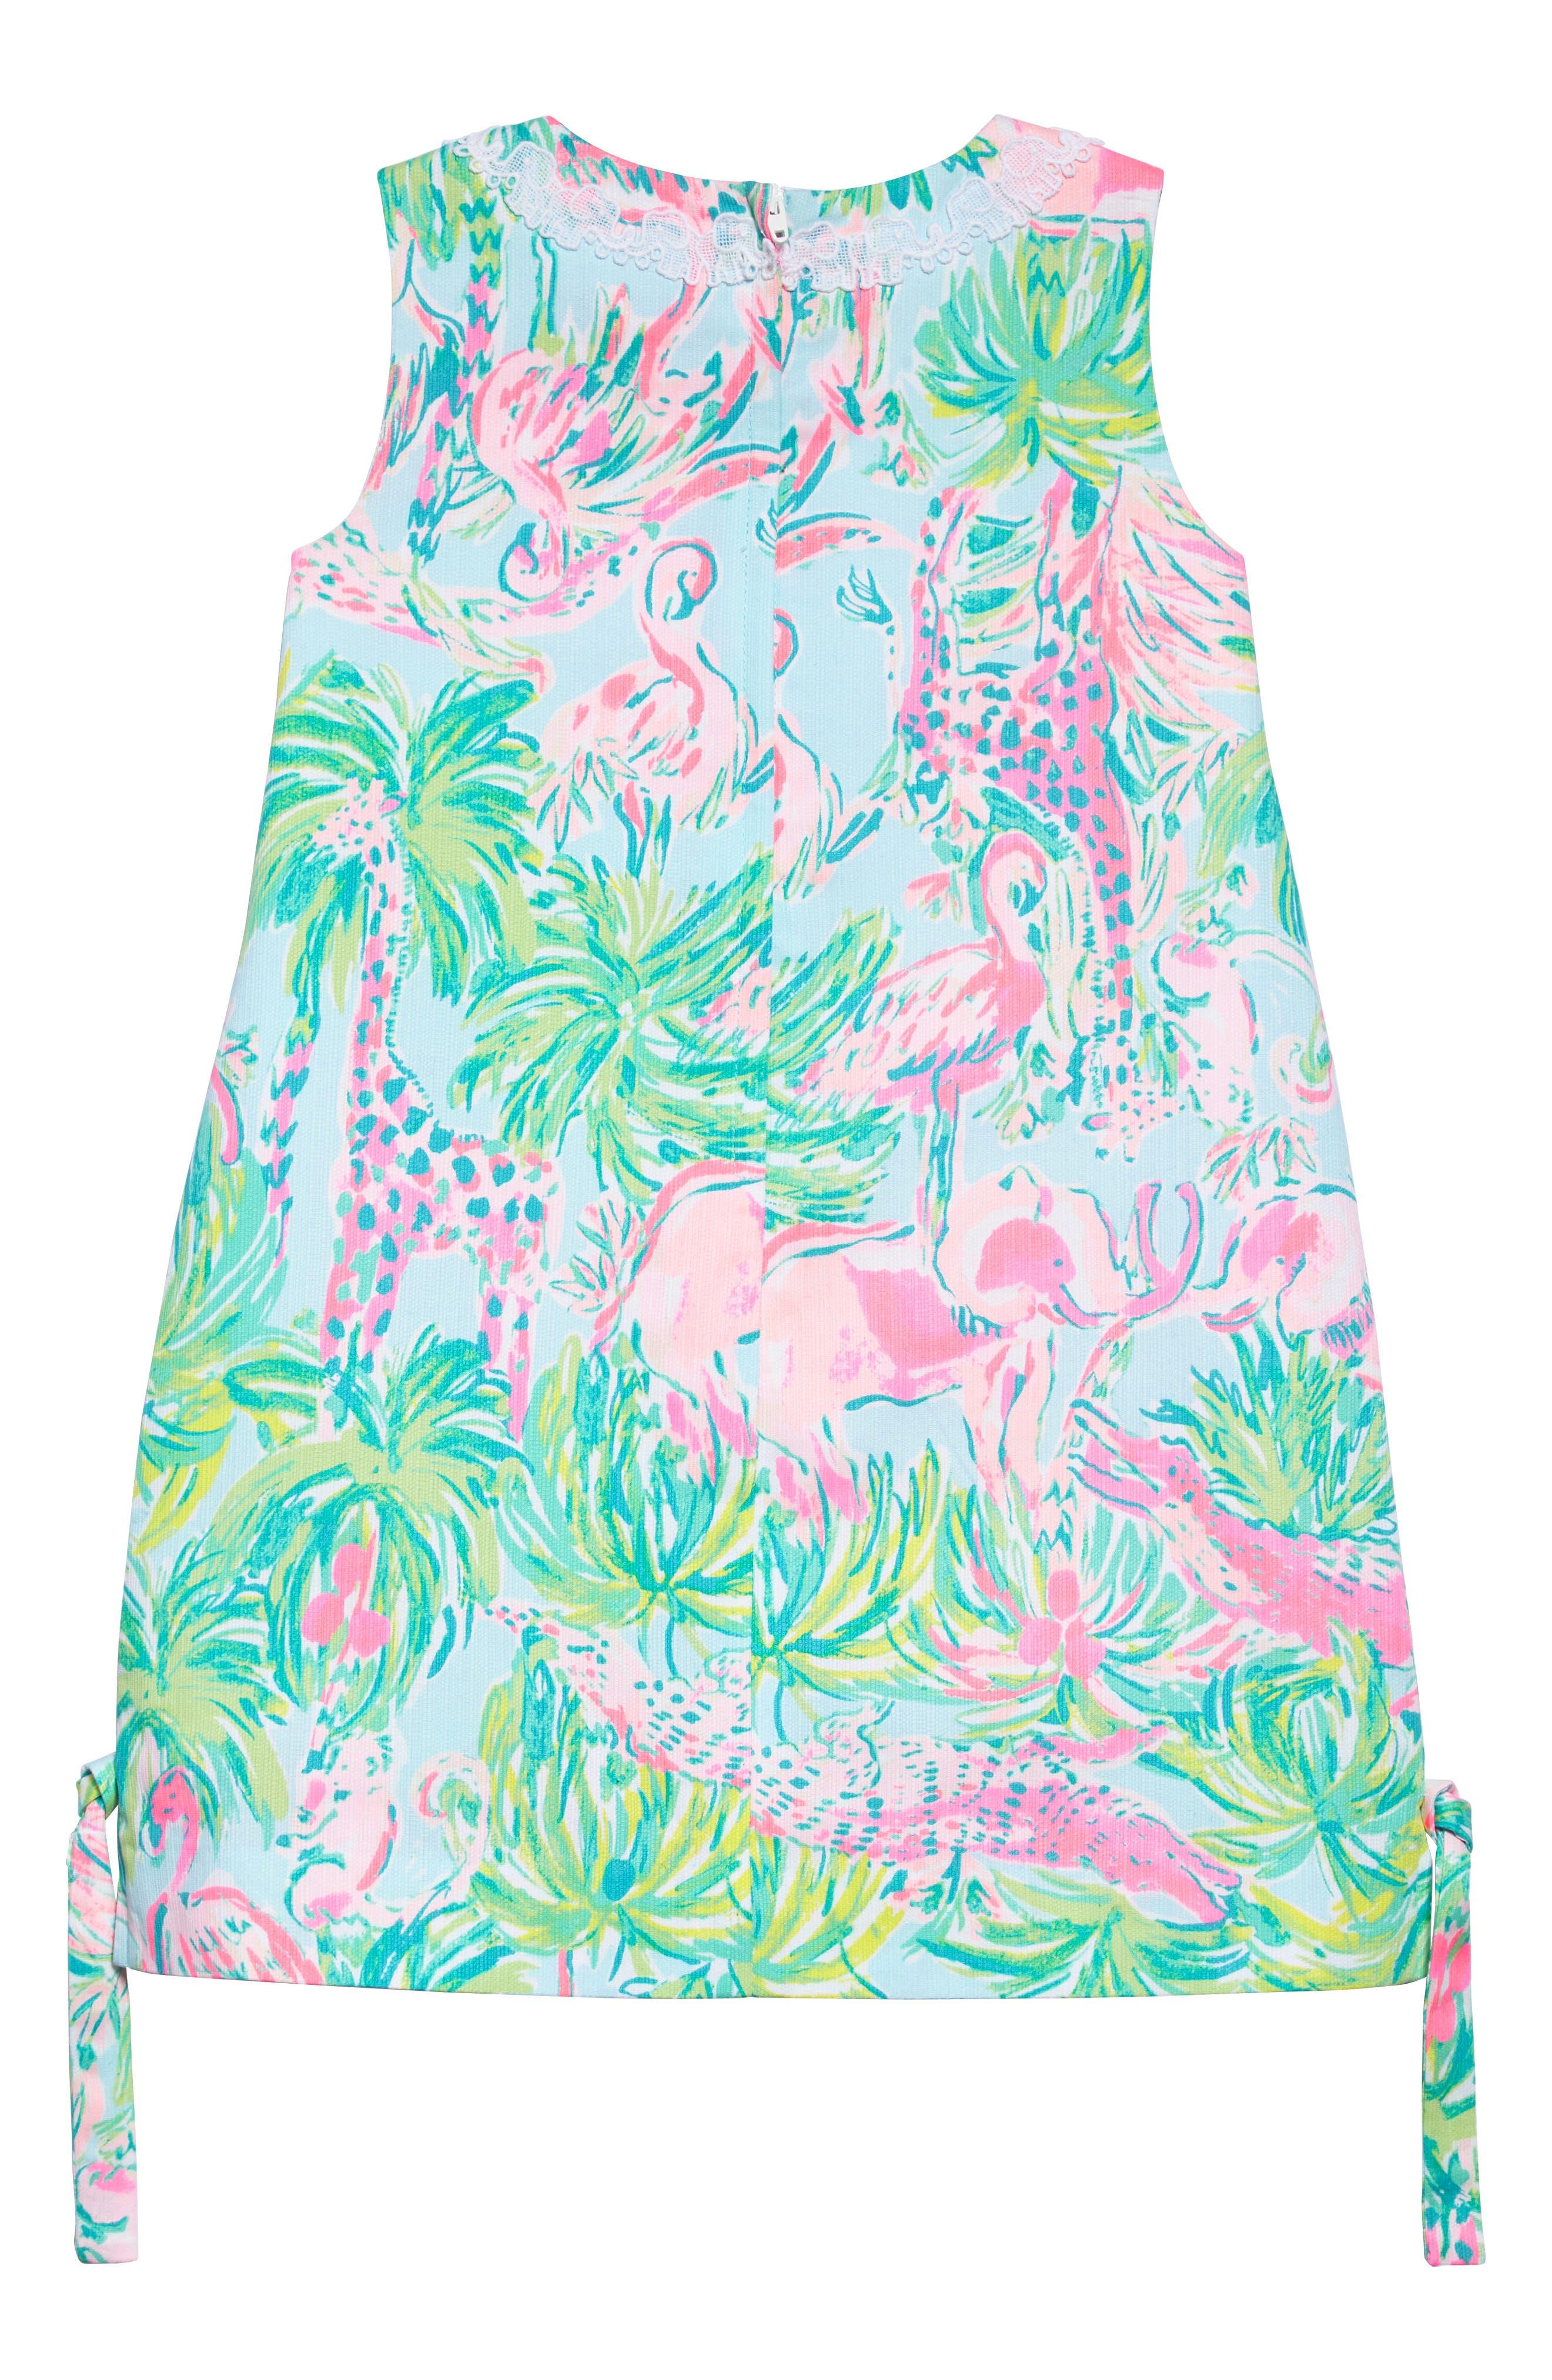 Little Lilly Shift Dress,                             Alternate thumbnail 2, color,                             Seasalt Blue On Parade